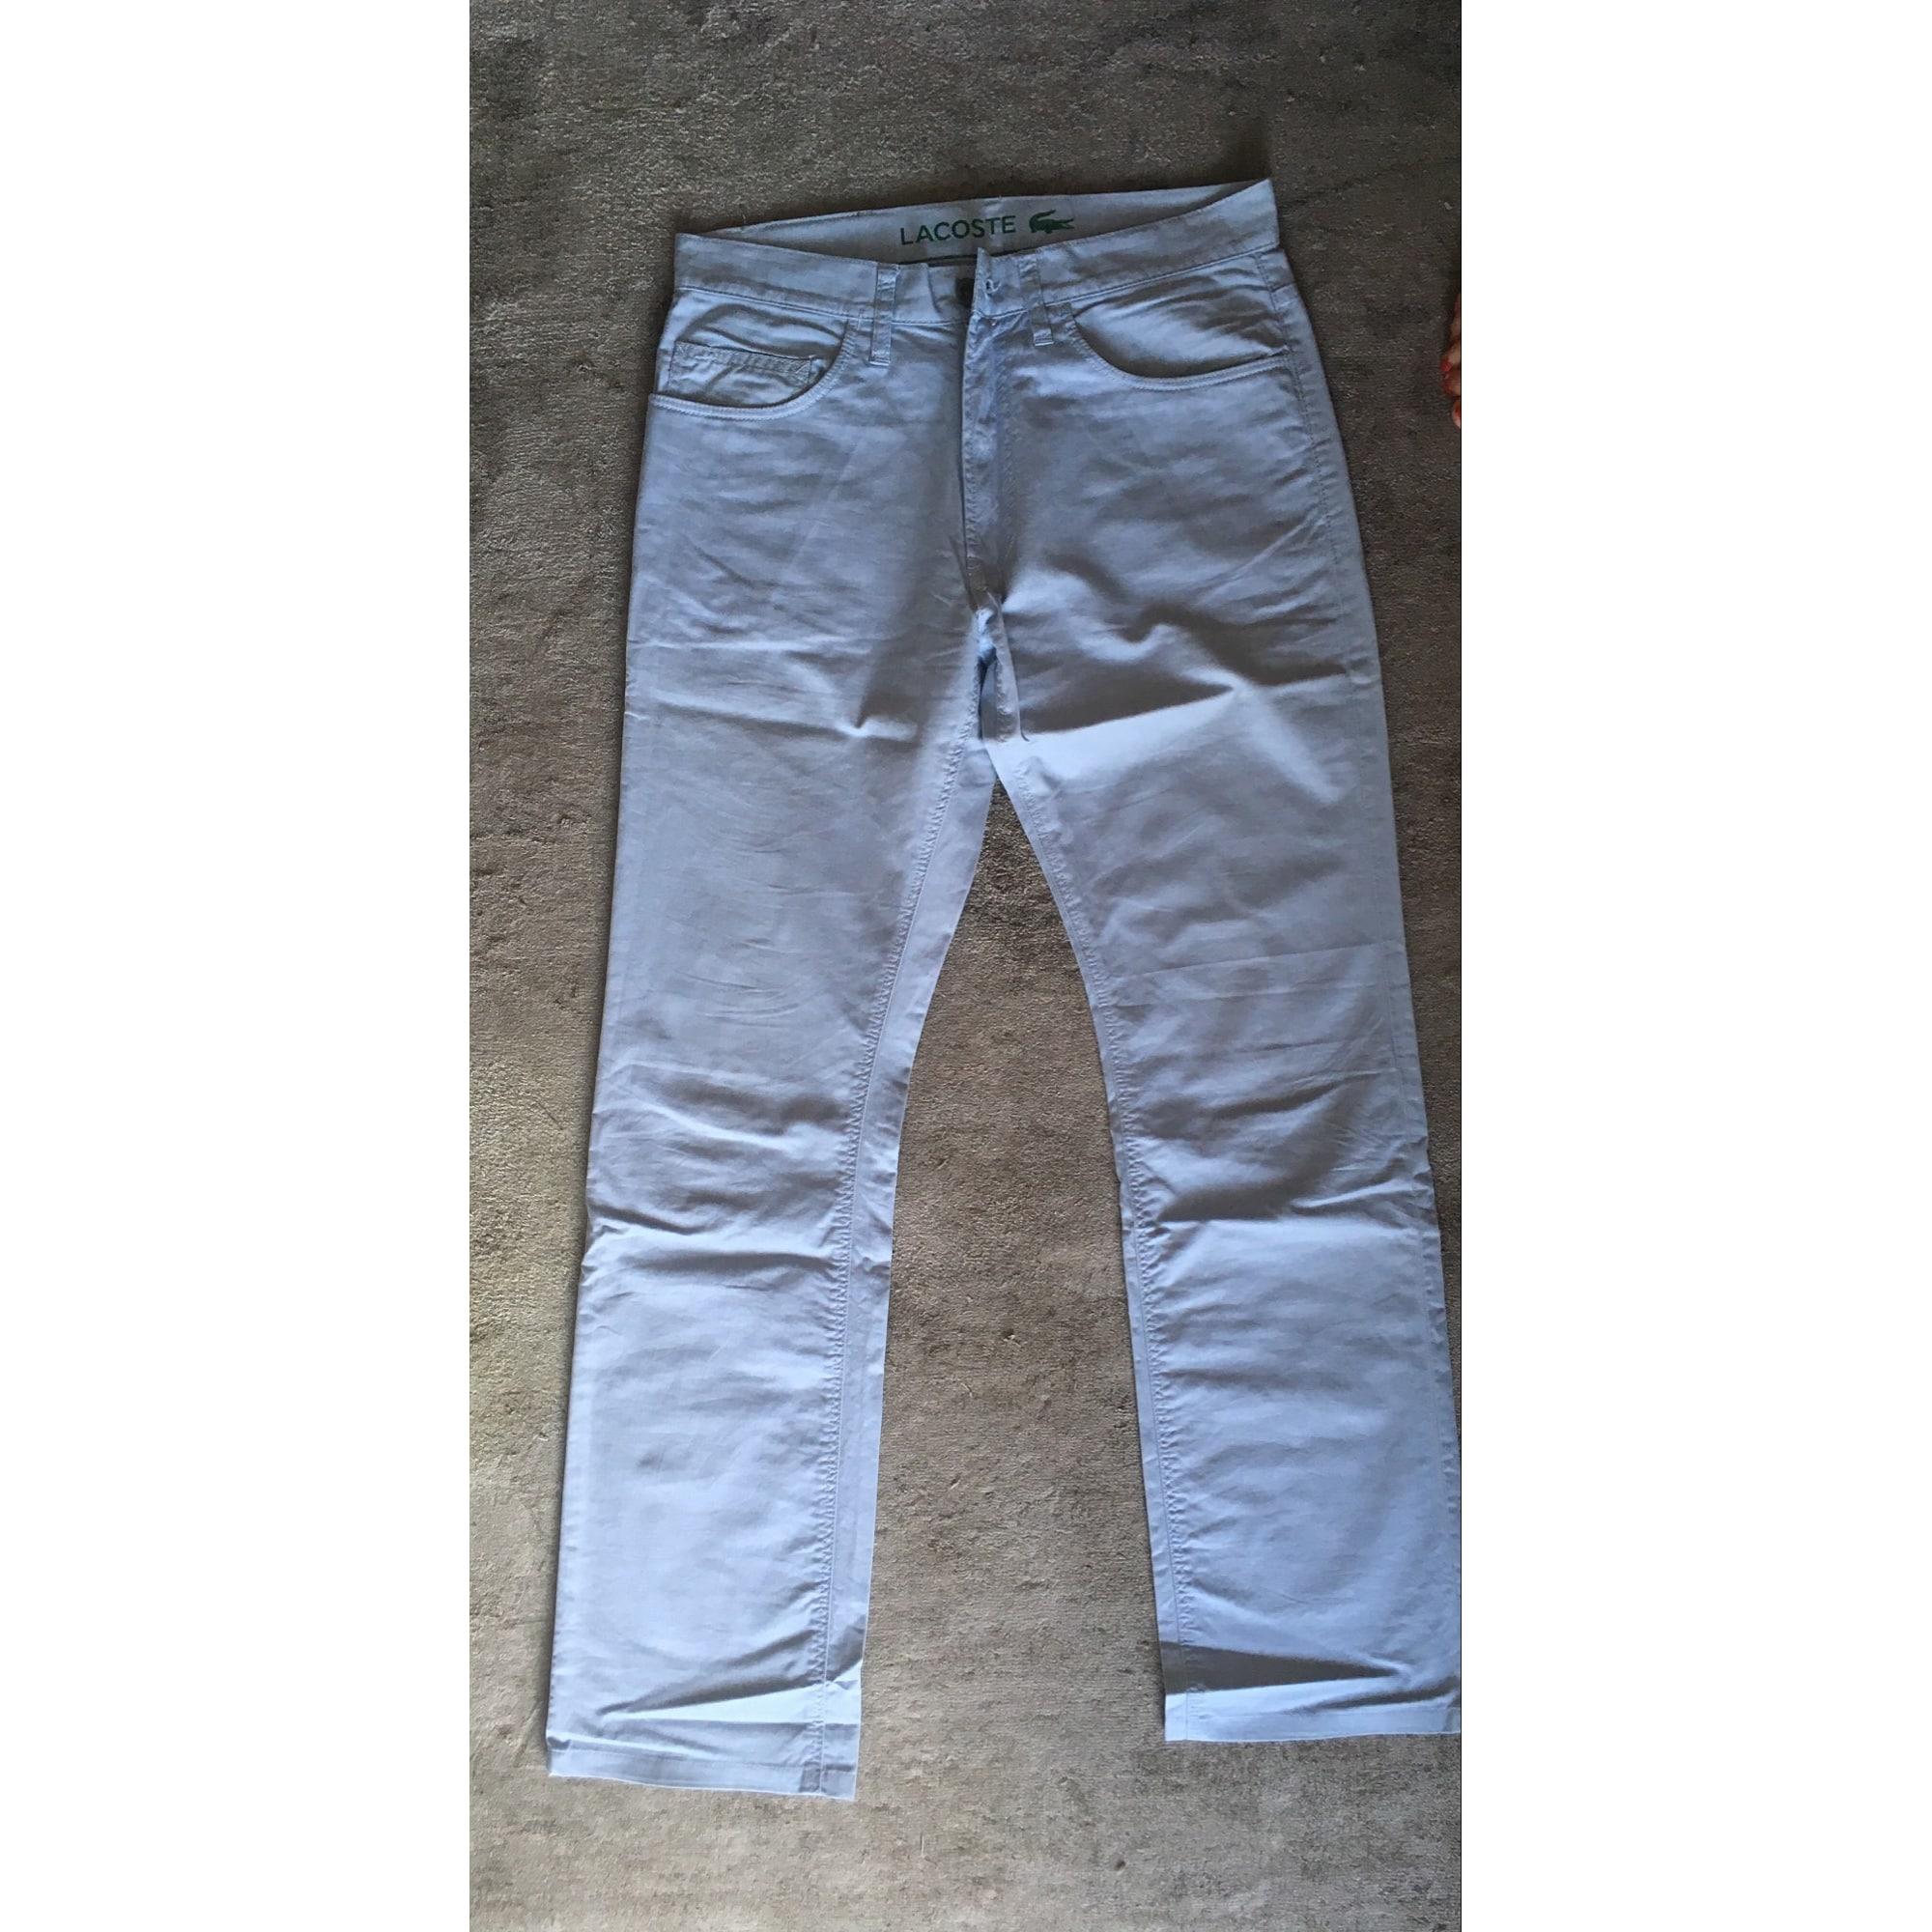 Pantalon droit LACOSTE Bleu, bleu marine, bleu turquoise